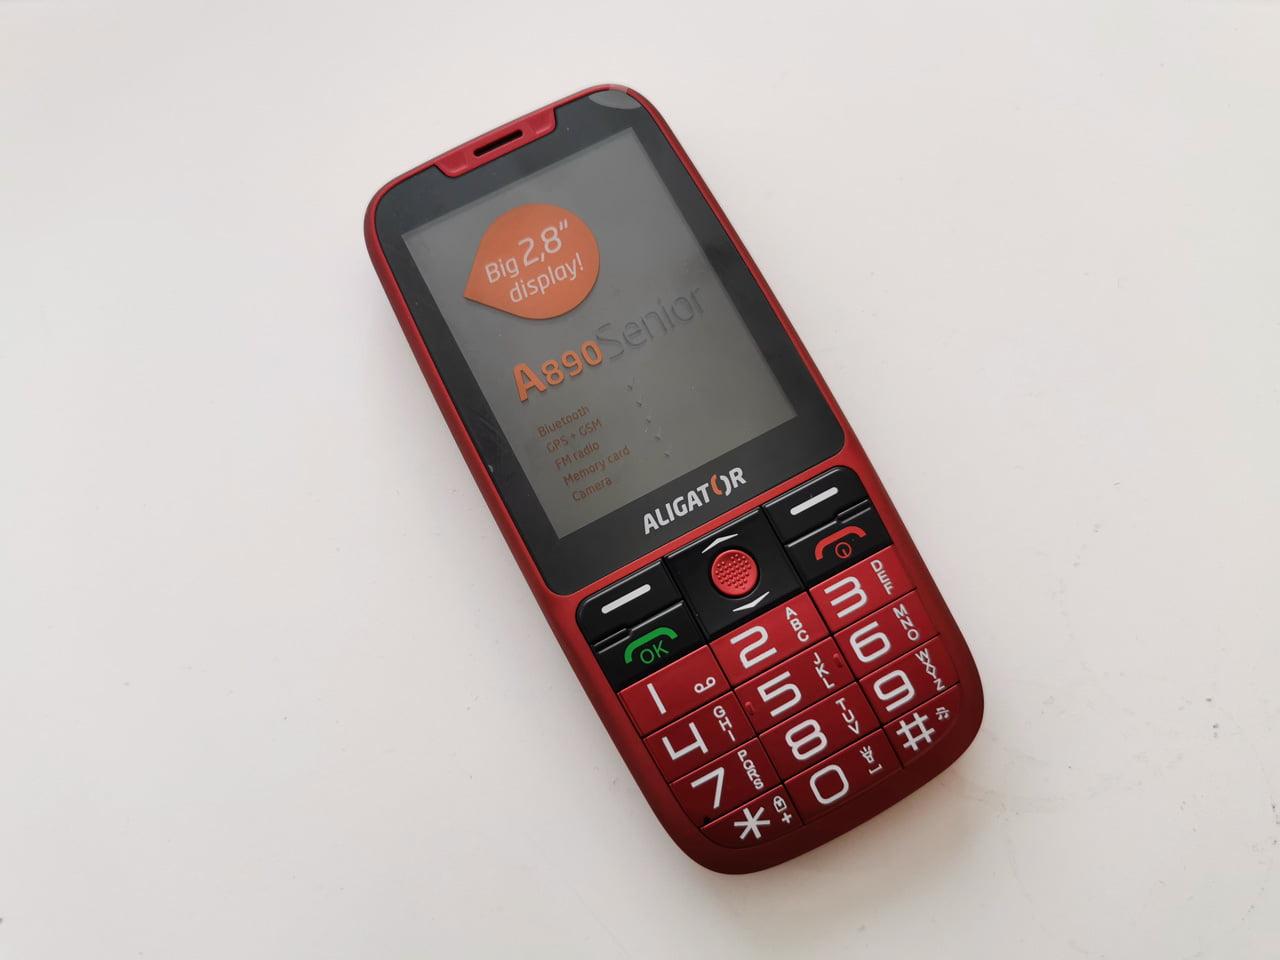 Český telefon Aligator A890 Senior